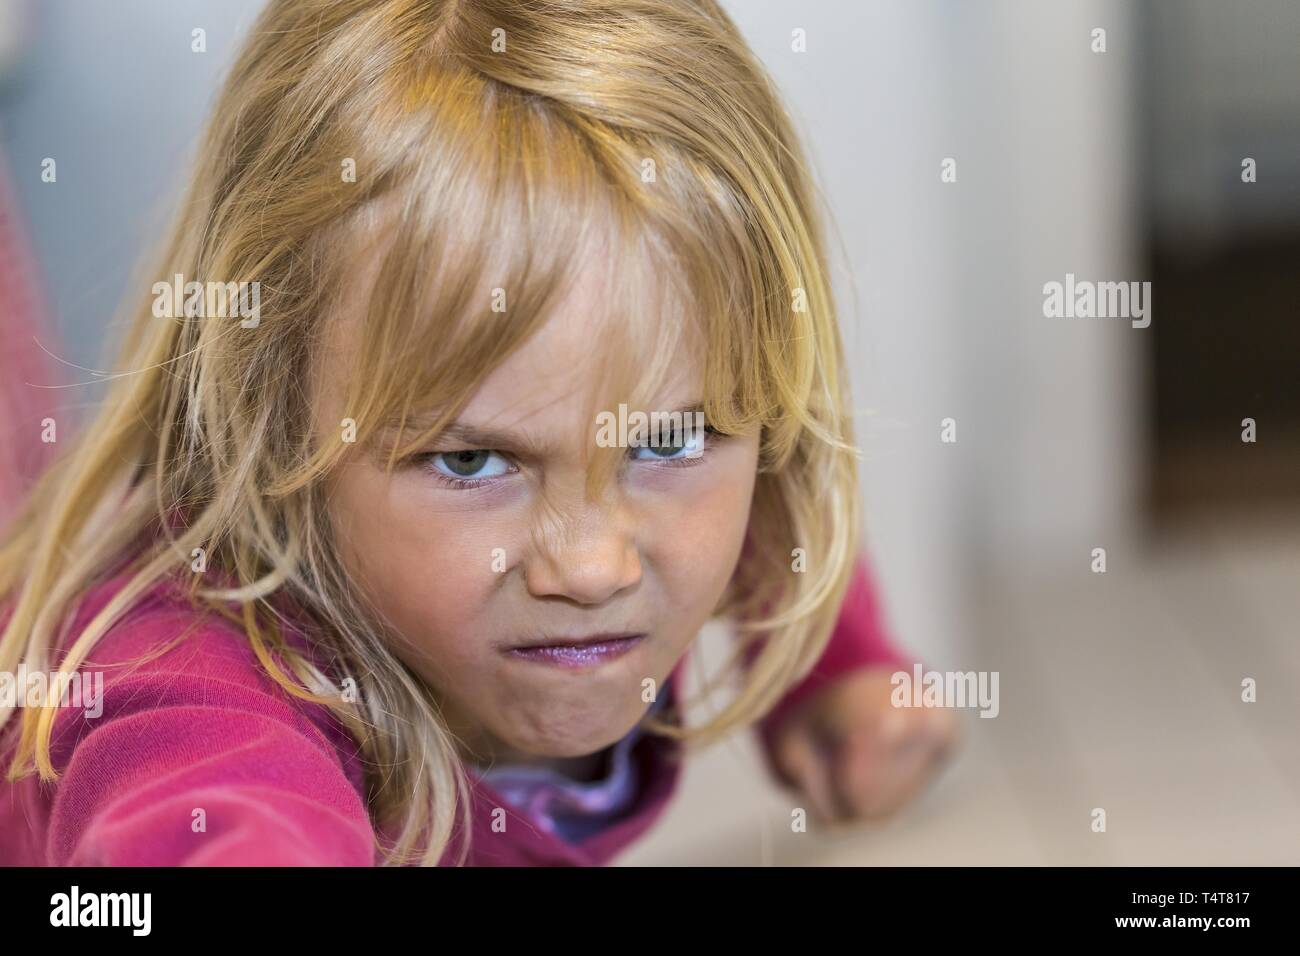 Girl (6) looks grim - Stock Image